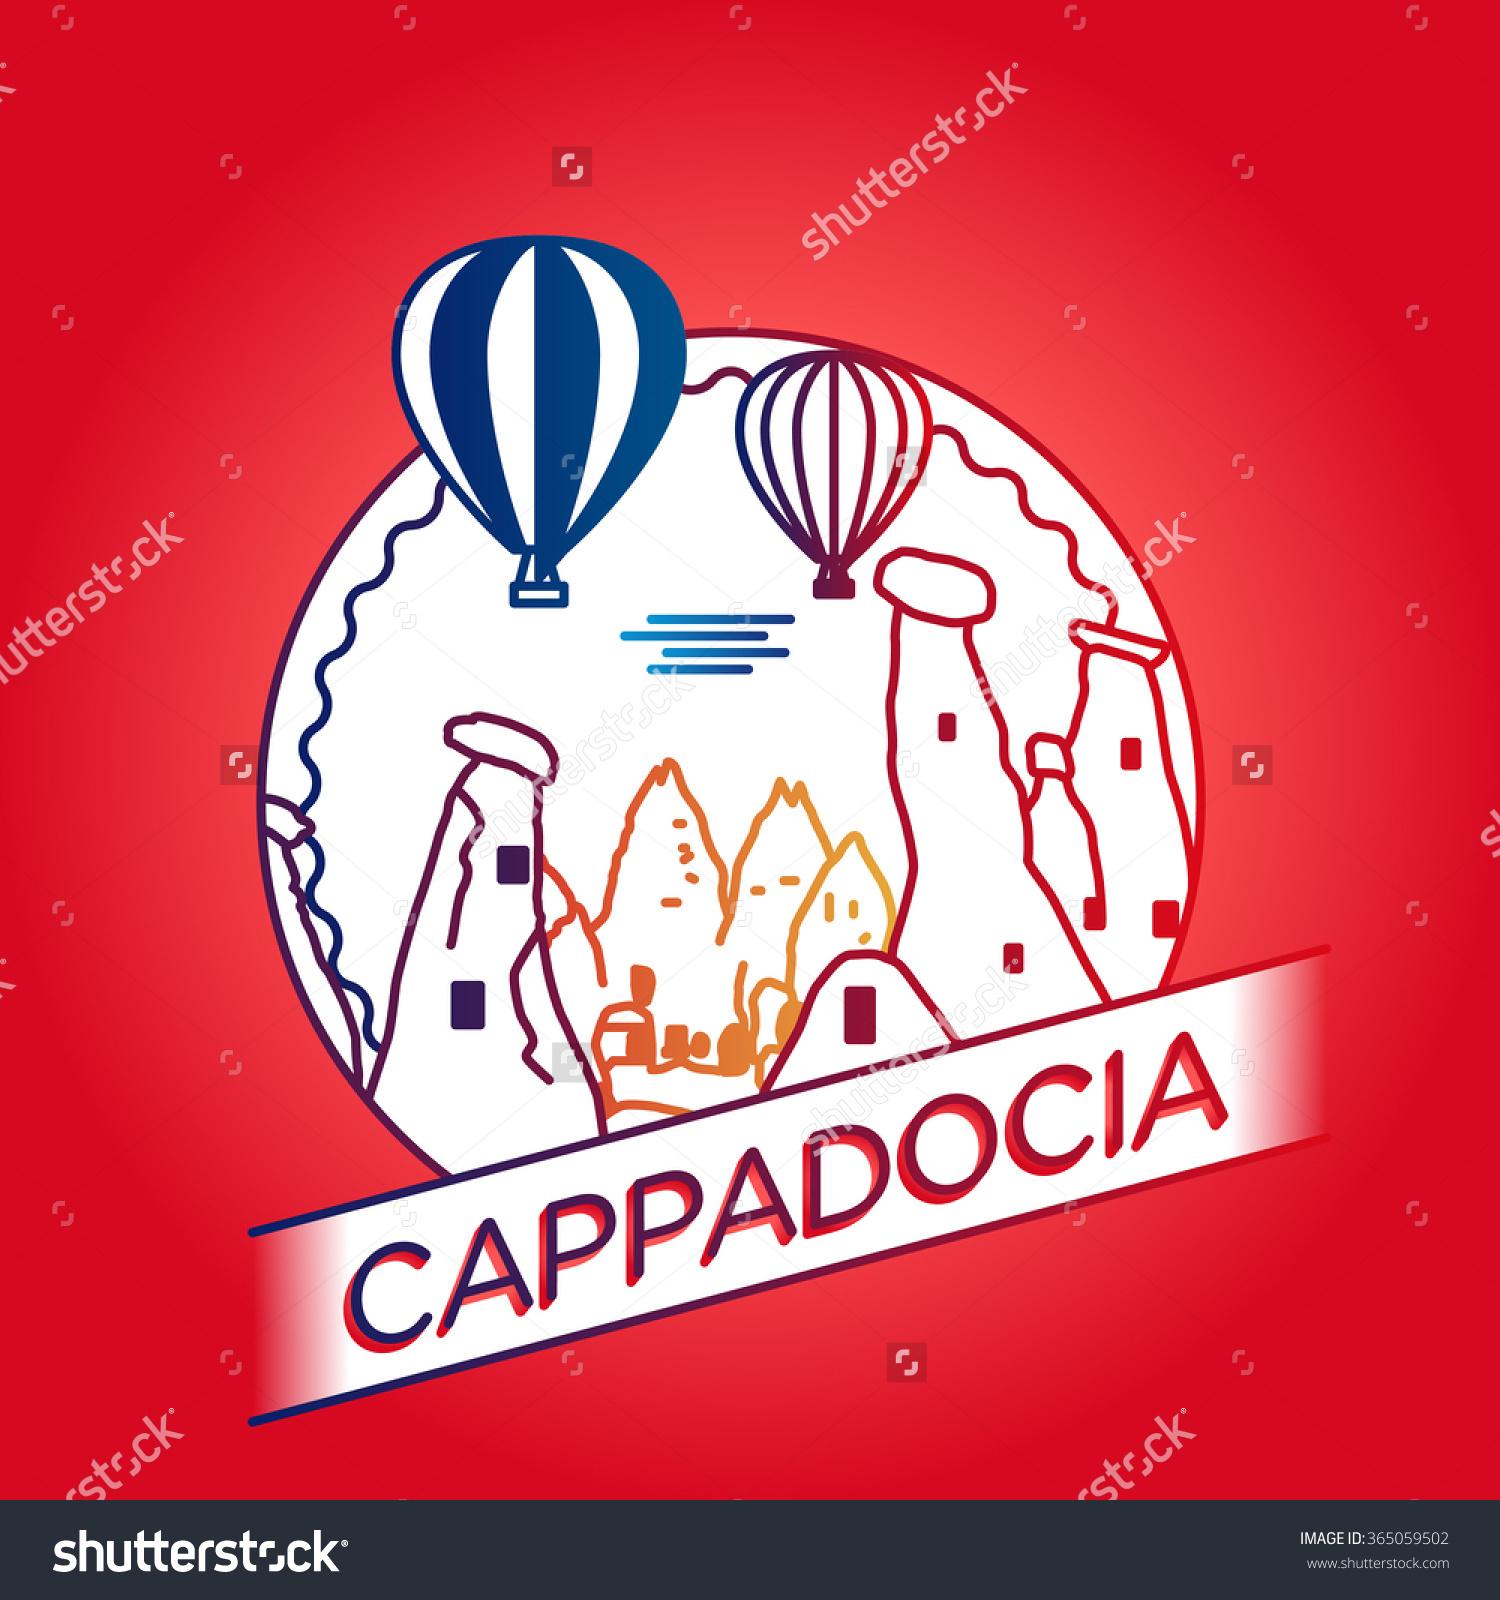 Cappadocia clipart #1, Download drawings